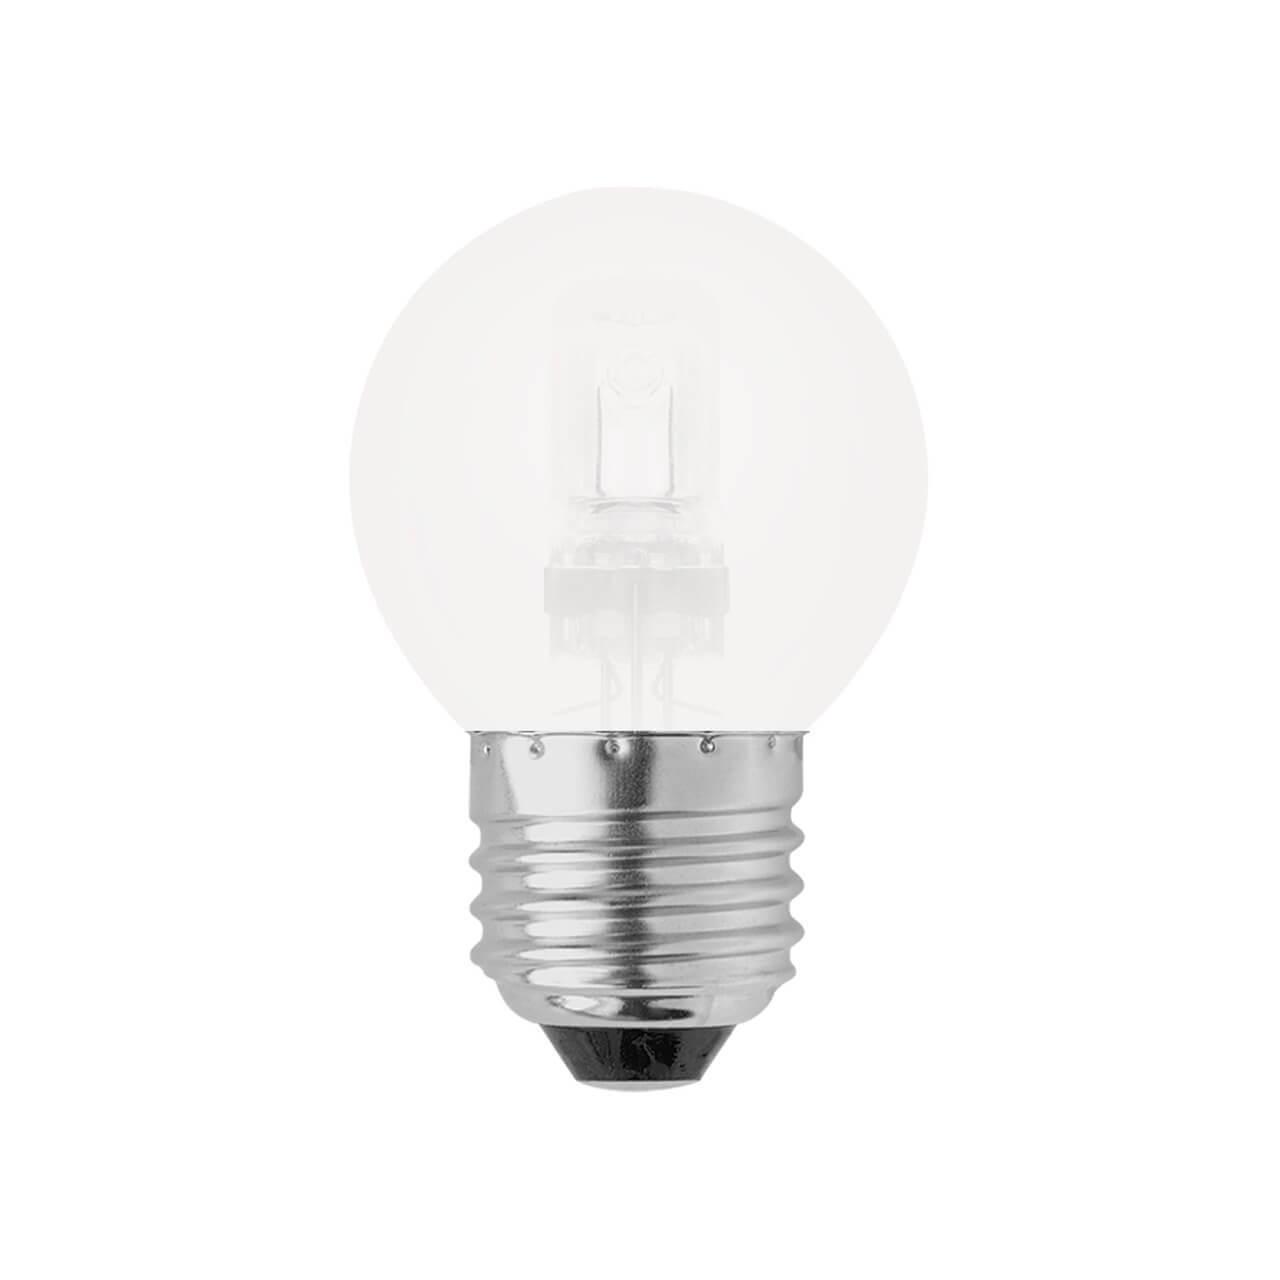 цена на Лампочка Uniel HCL-42/FR/E27 globe Globe